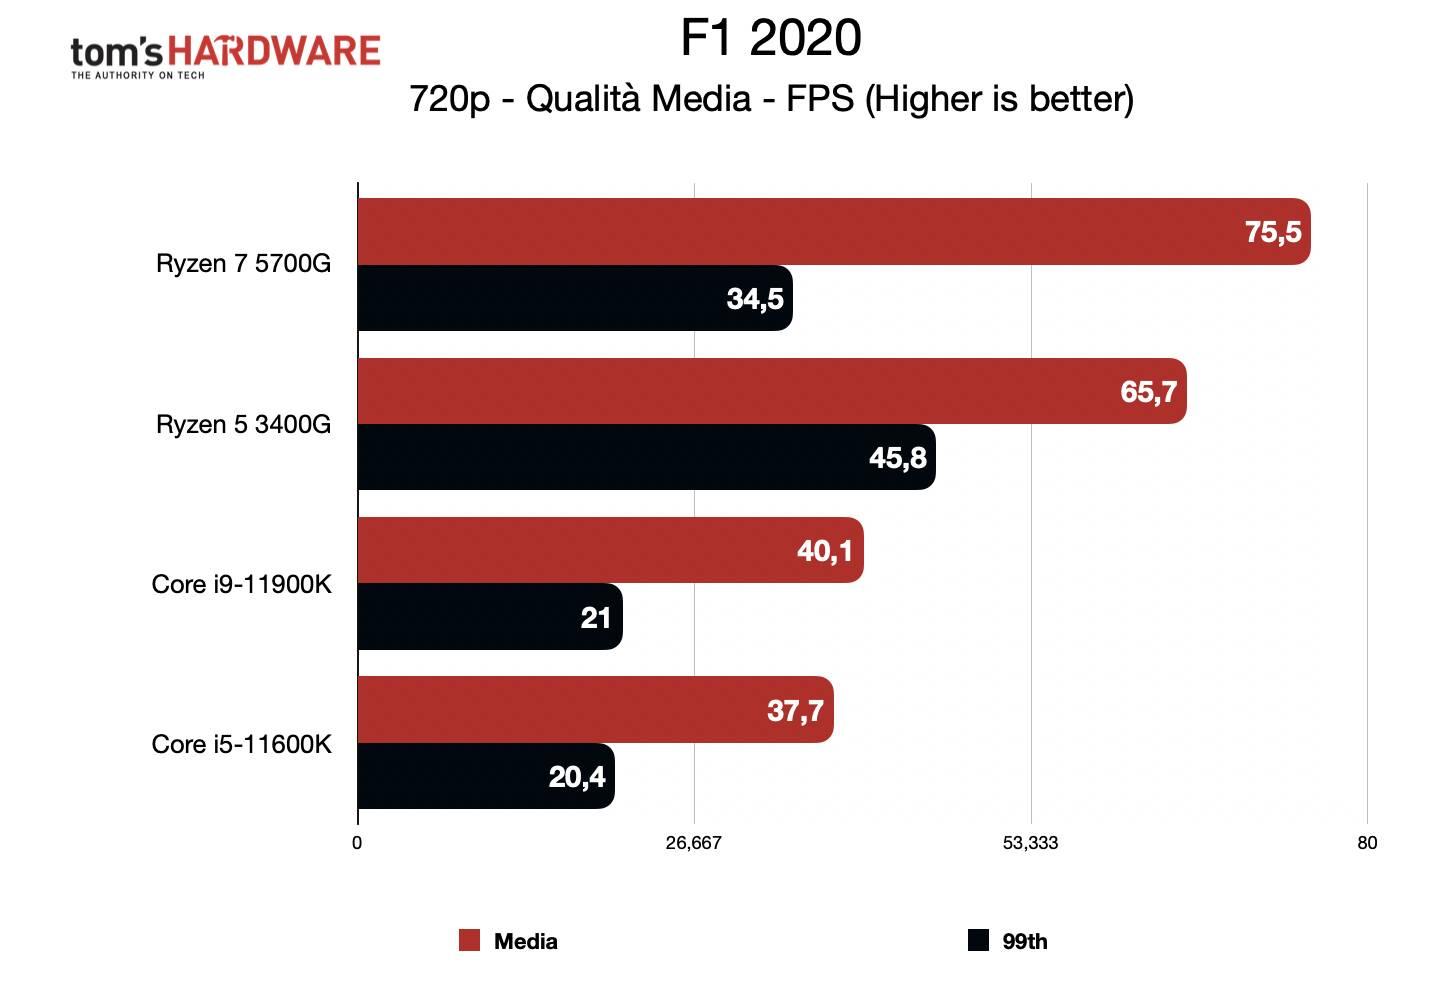 Benchmark Ryzen 7 5700G - Grafica integrata 720p - F1 2020